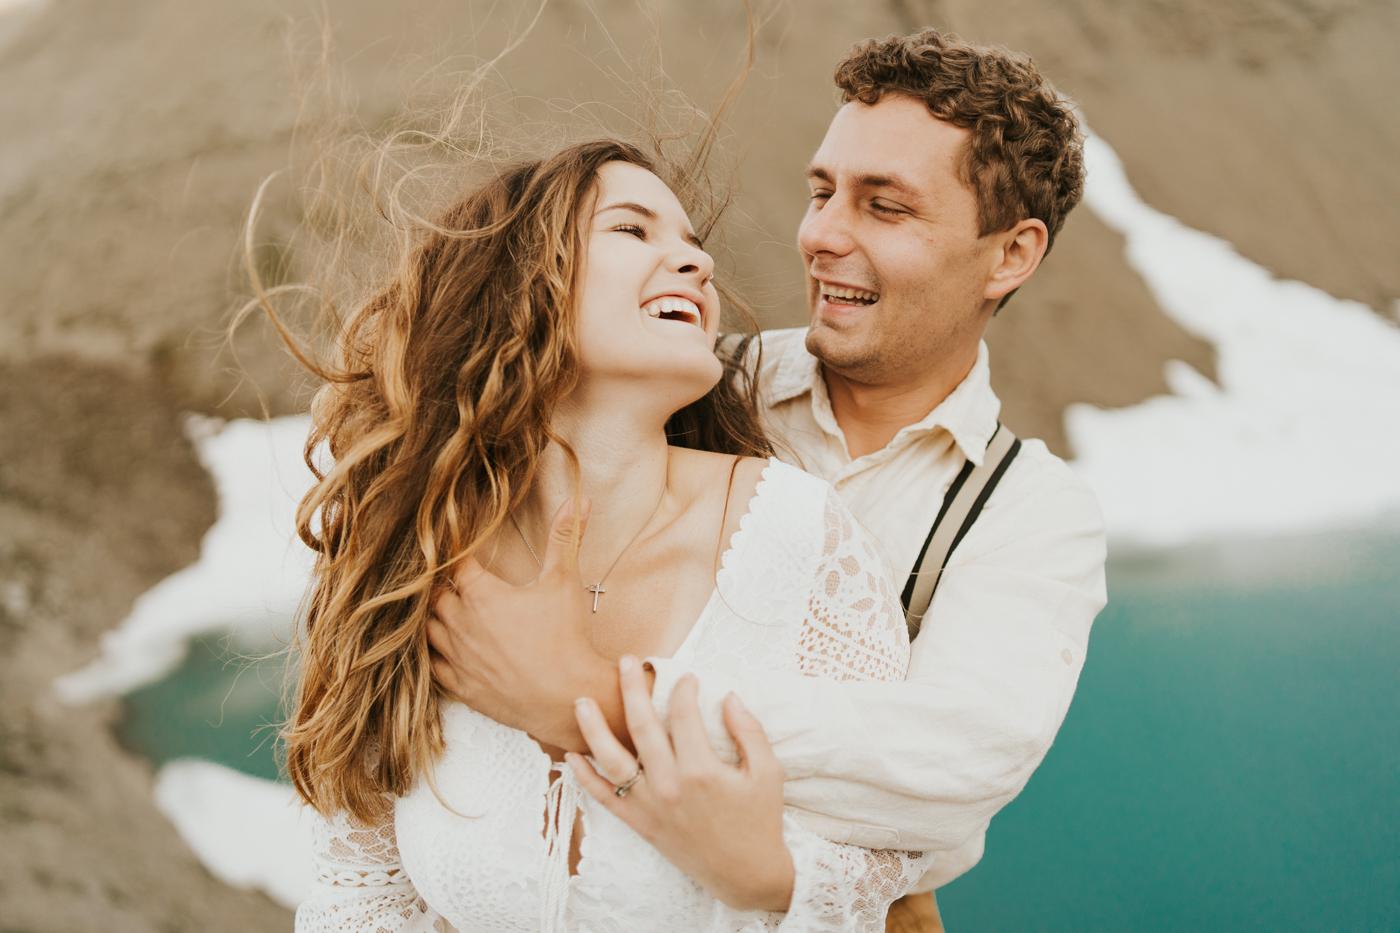 tyraephotography_photographer_wedding_elopement_engagement_photography-07849.jpg